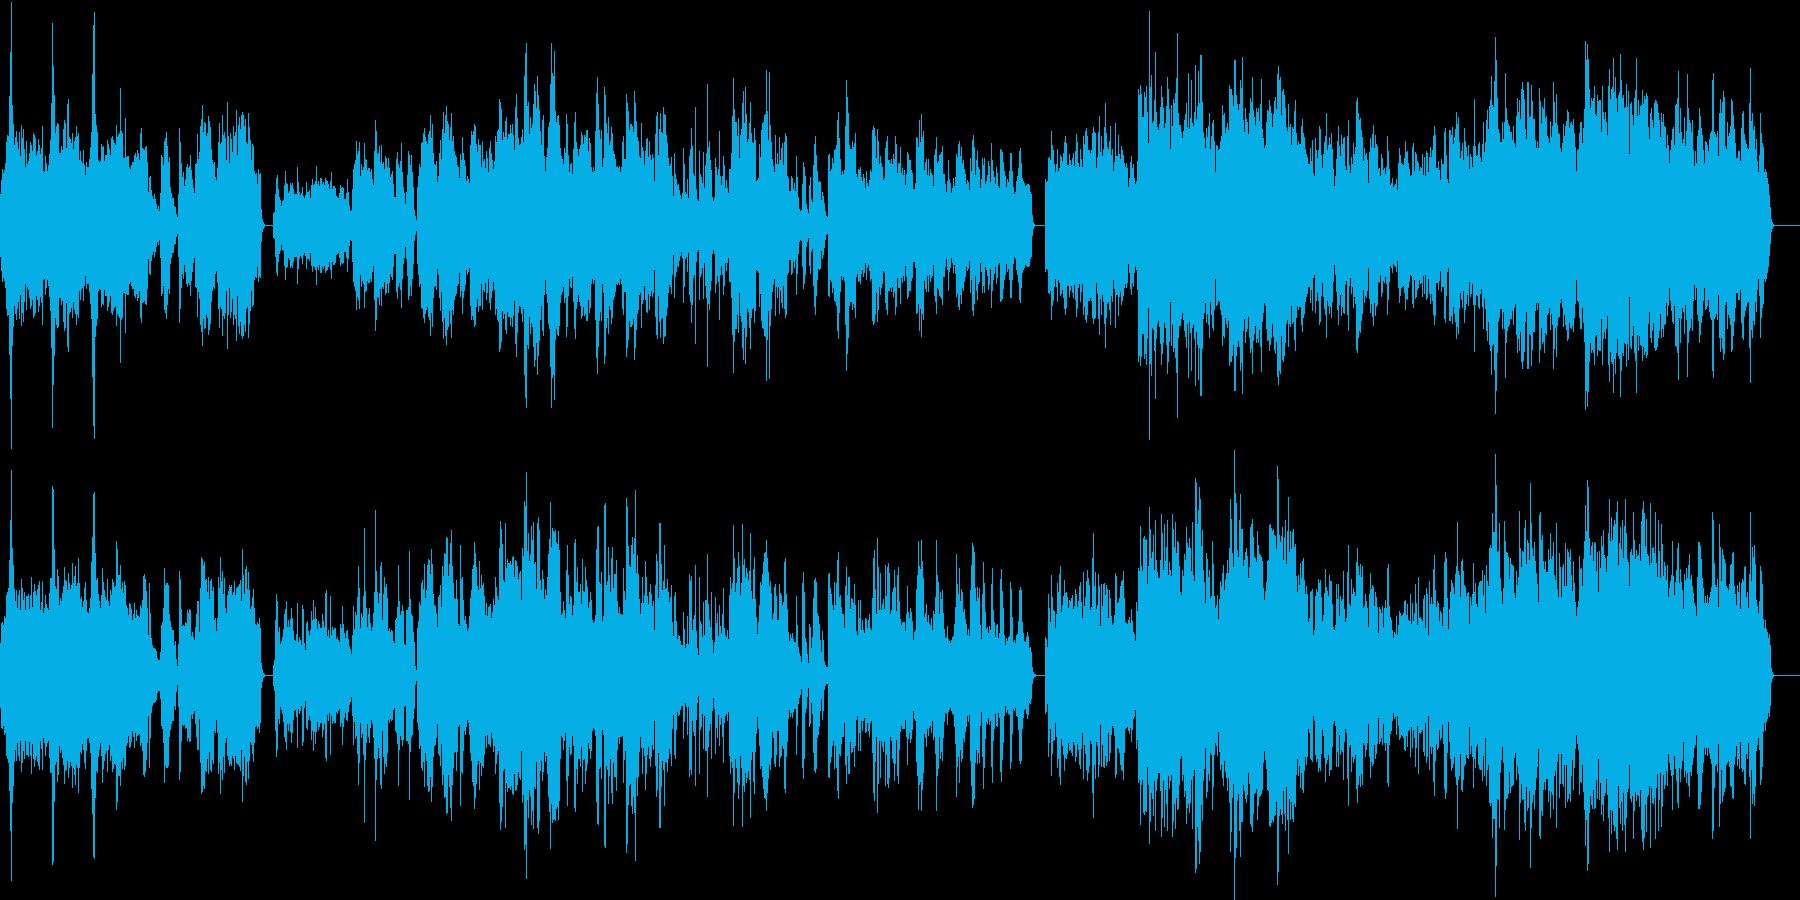 Story of Seaの再生済みの波形